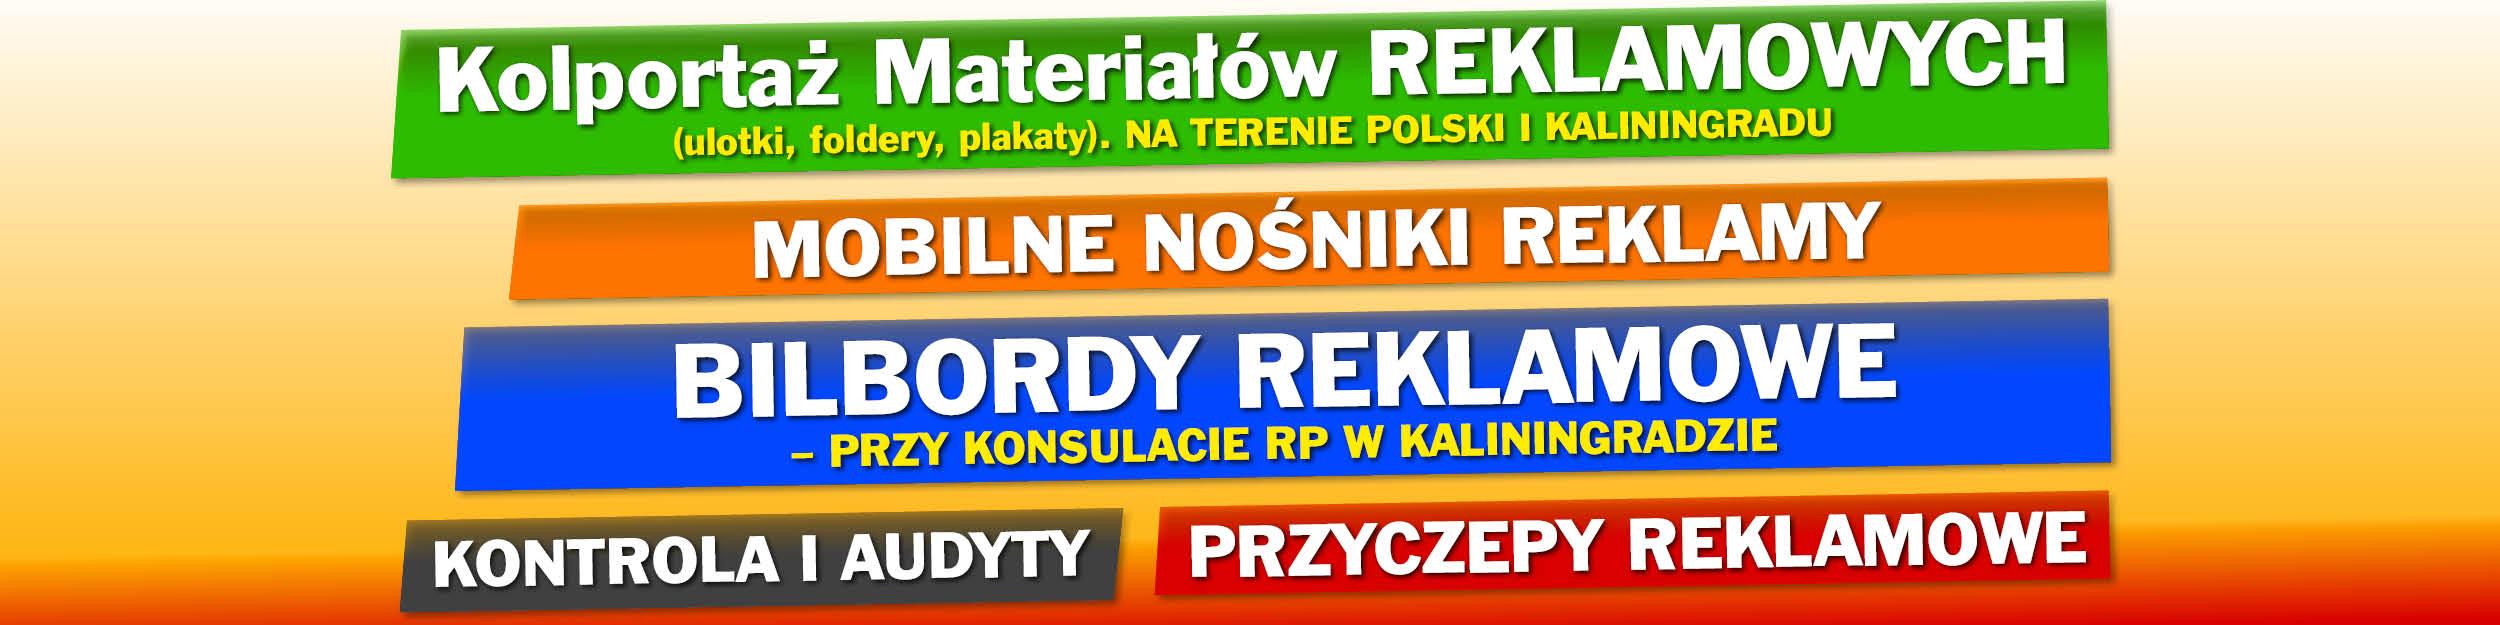 Kolportaż Polska DMR Sp. z o.o.